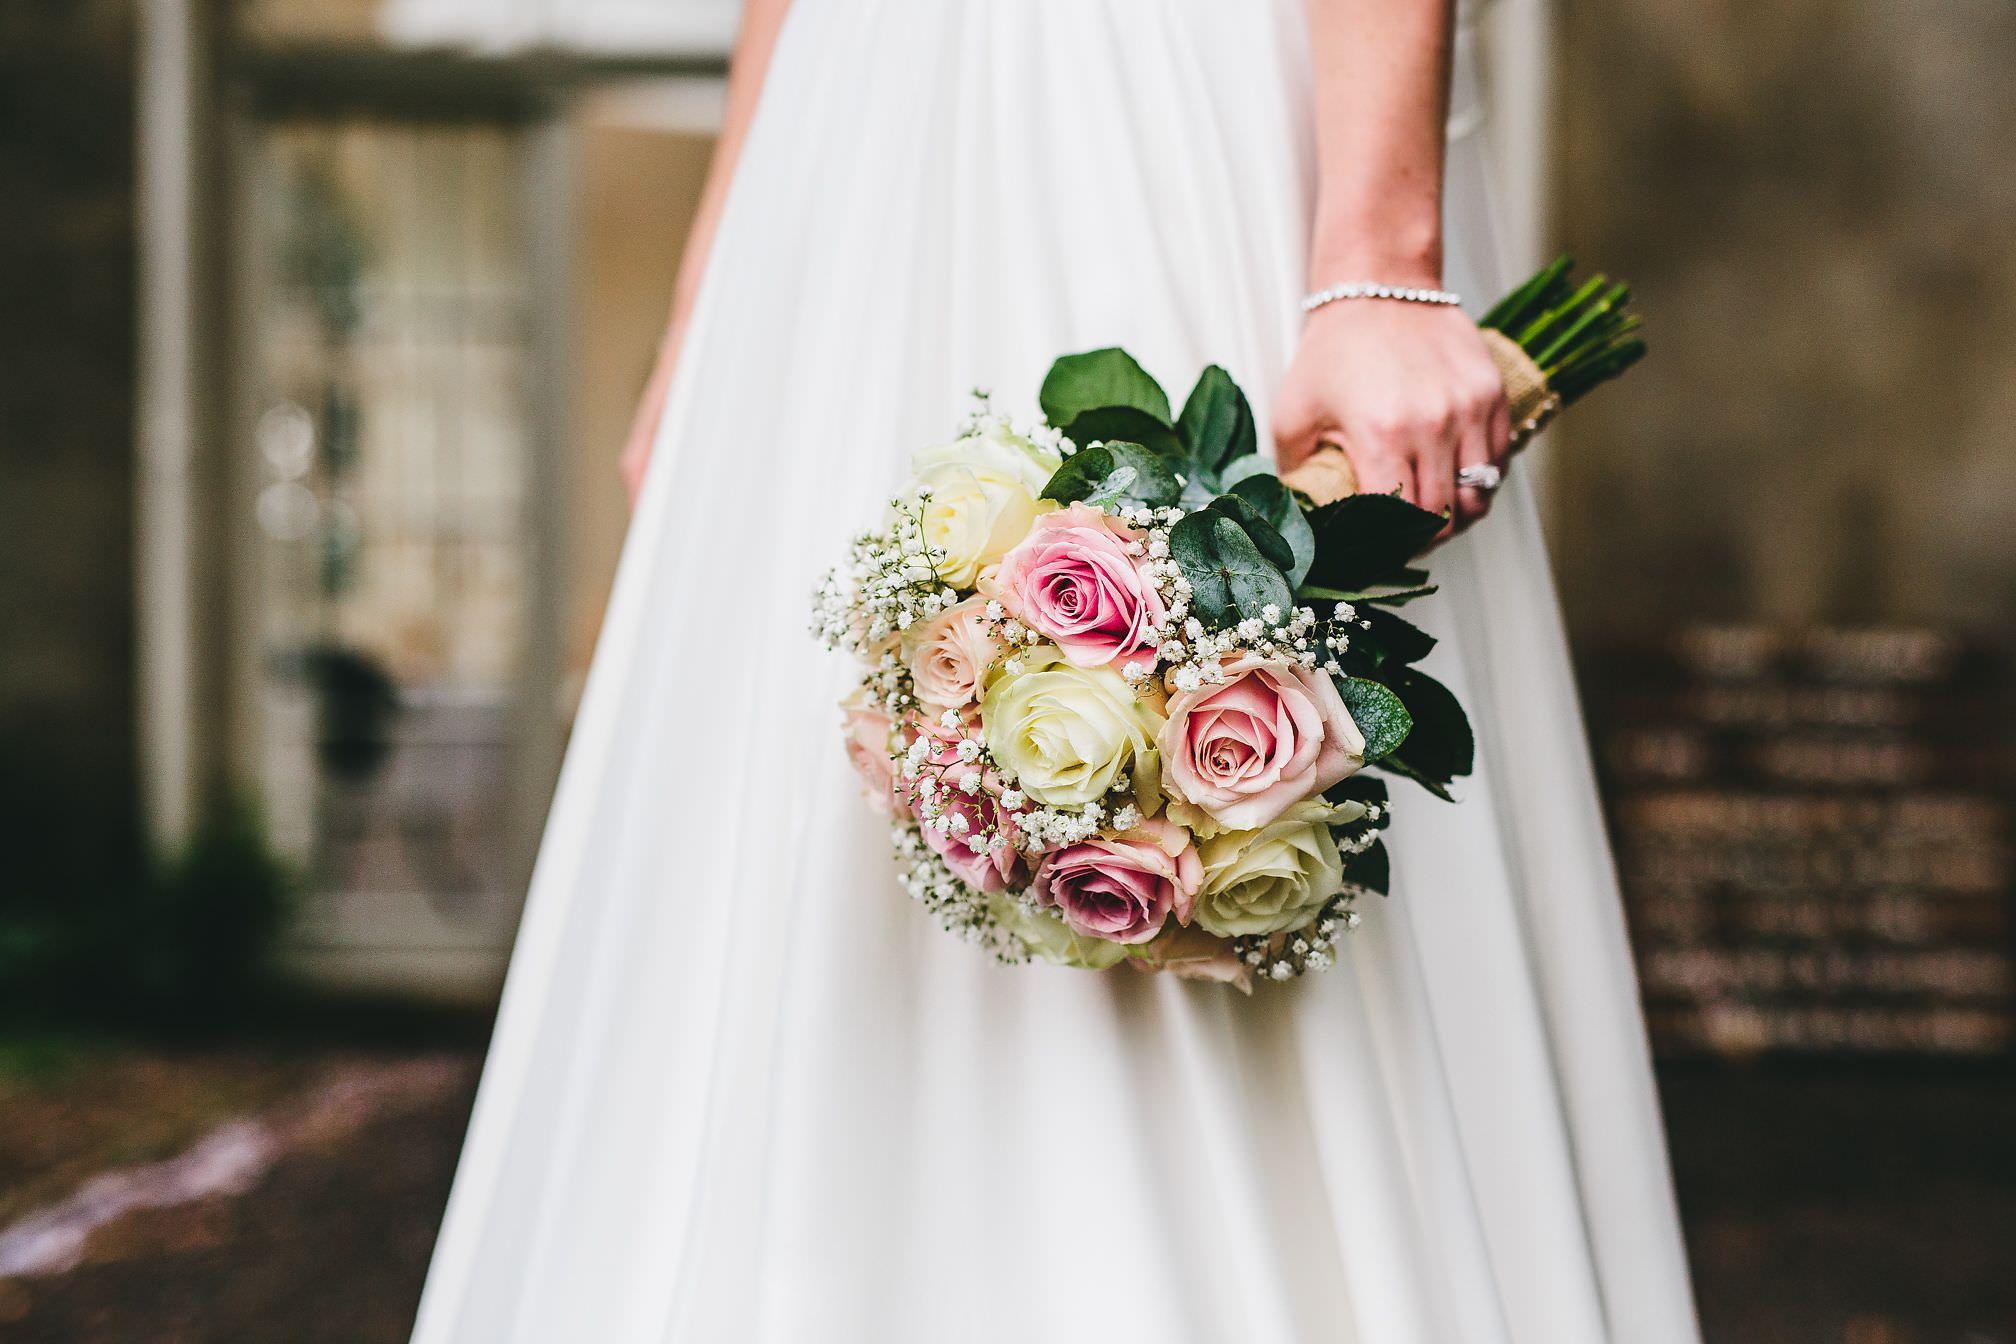 Stunning bridal bouqet